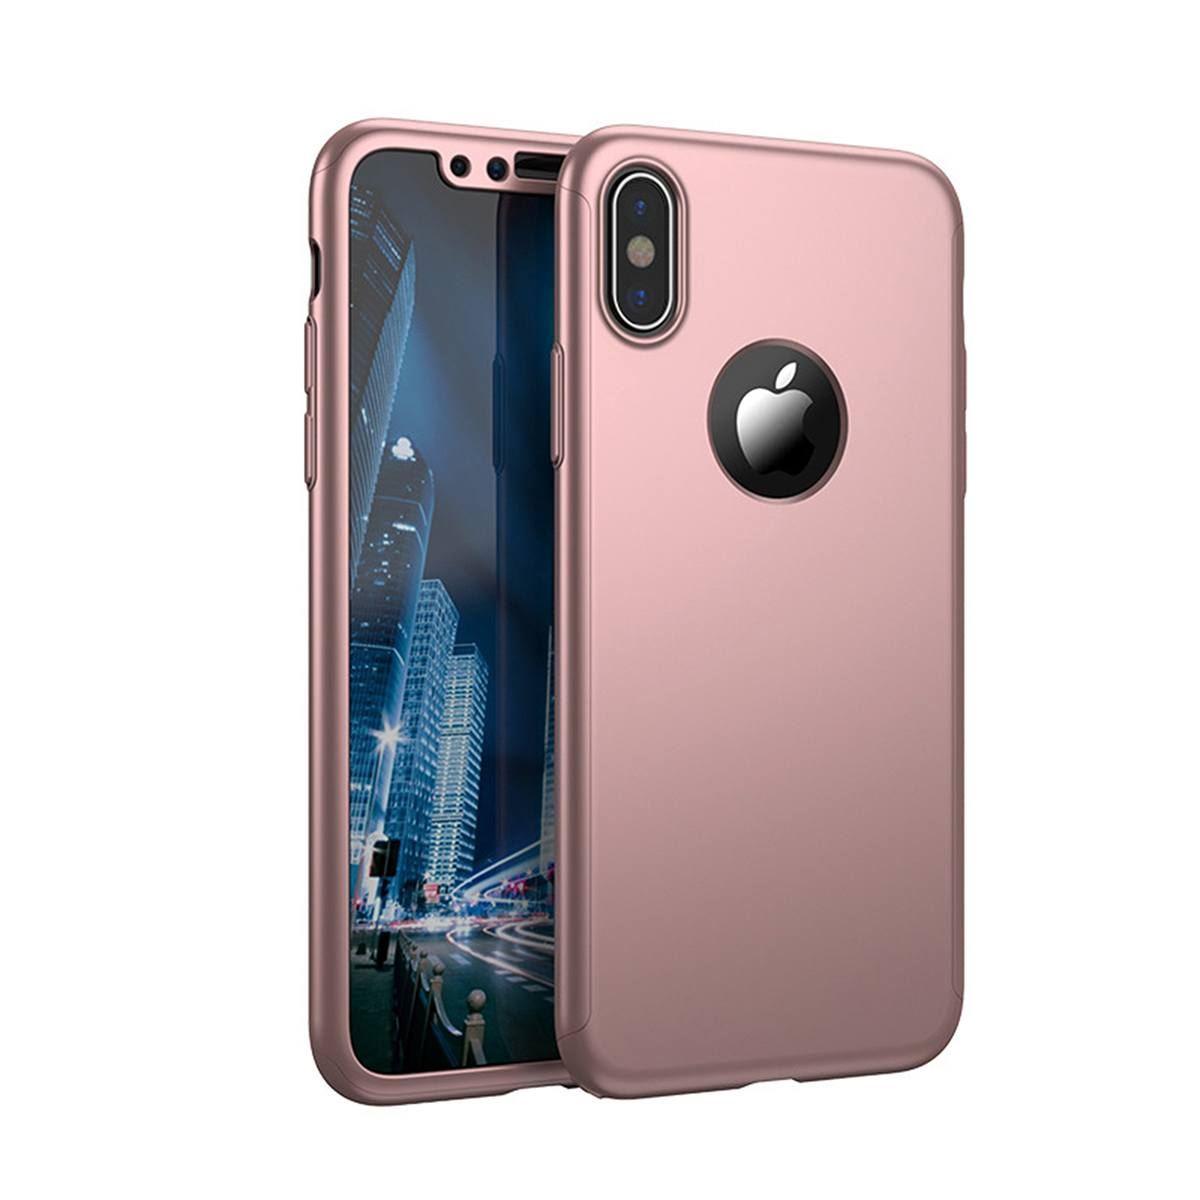 For-Apple-iPhone-XS-Max-XR-Hybrid-360-Slim-Ultra-Thin-Heavy-Duty-Shockproof-Case Indexbild 33